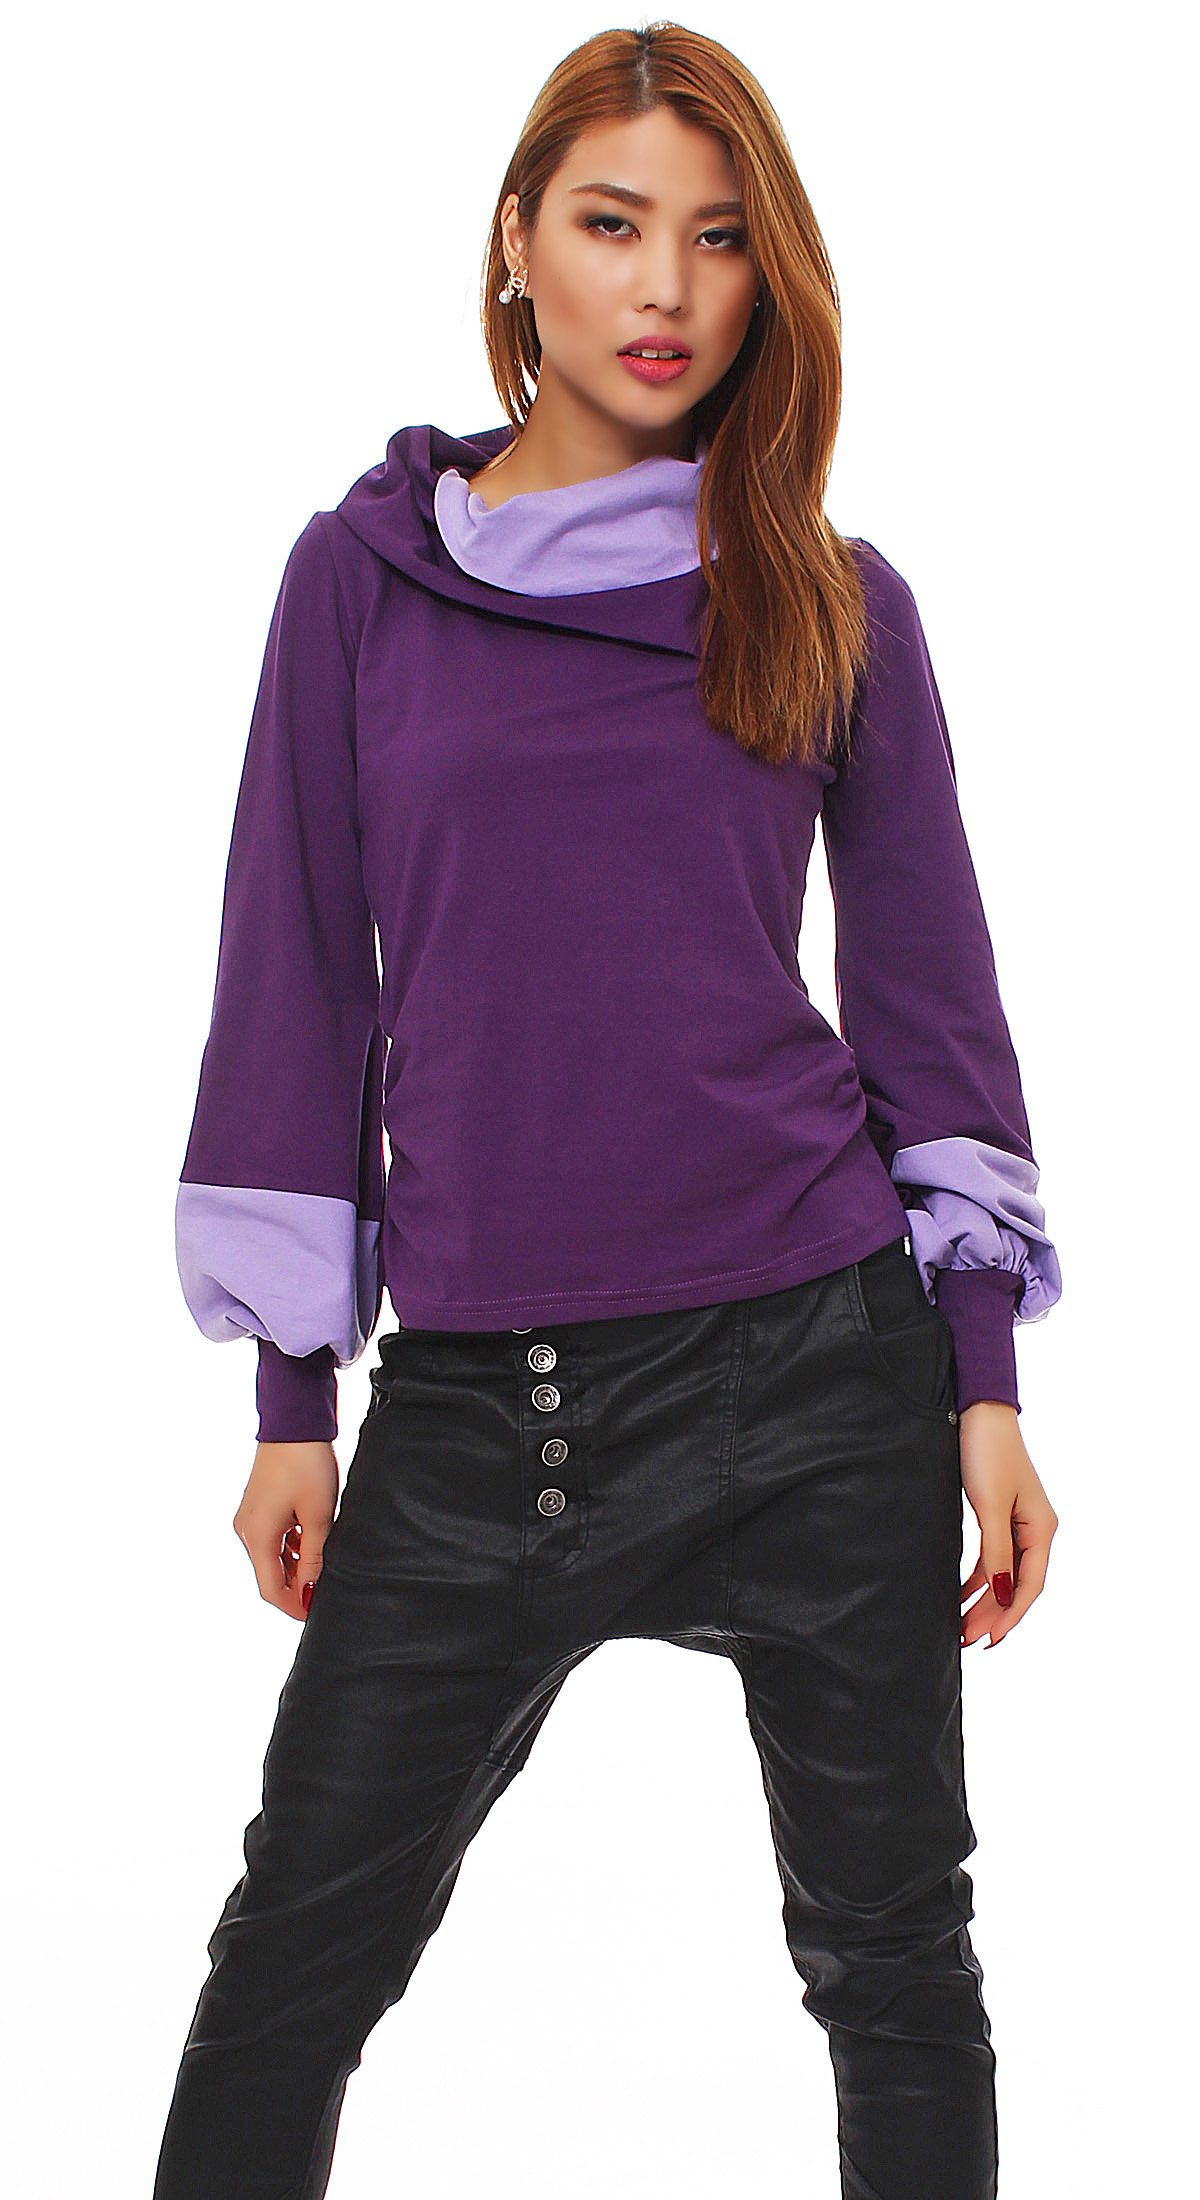 damen longshirt pullover bluse shirt tunika pulli langarm baumwolle ballon rmel ebay. Black Bedroom Furniture Sets. Home Design Ideas